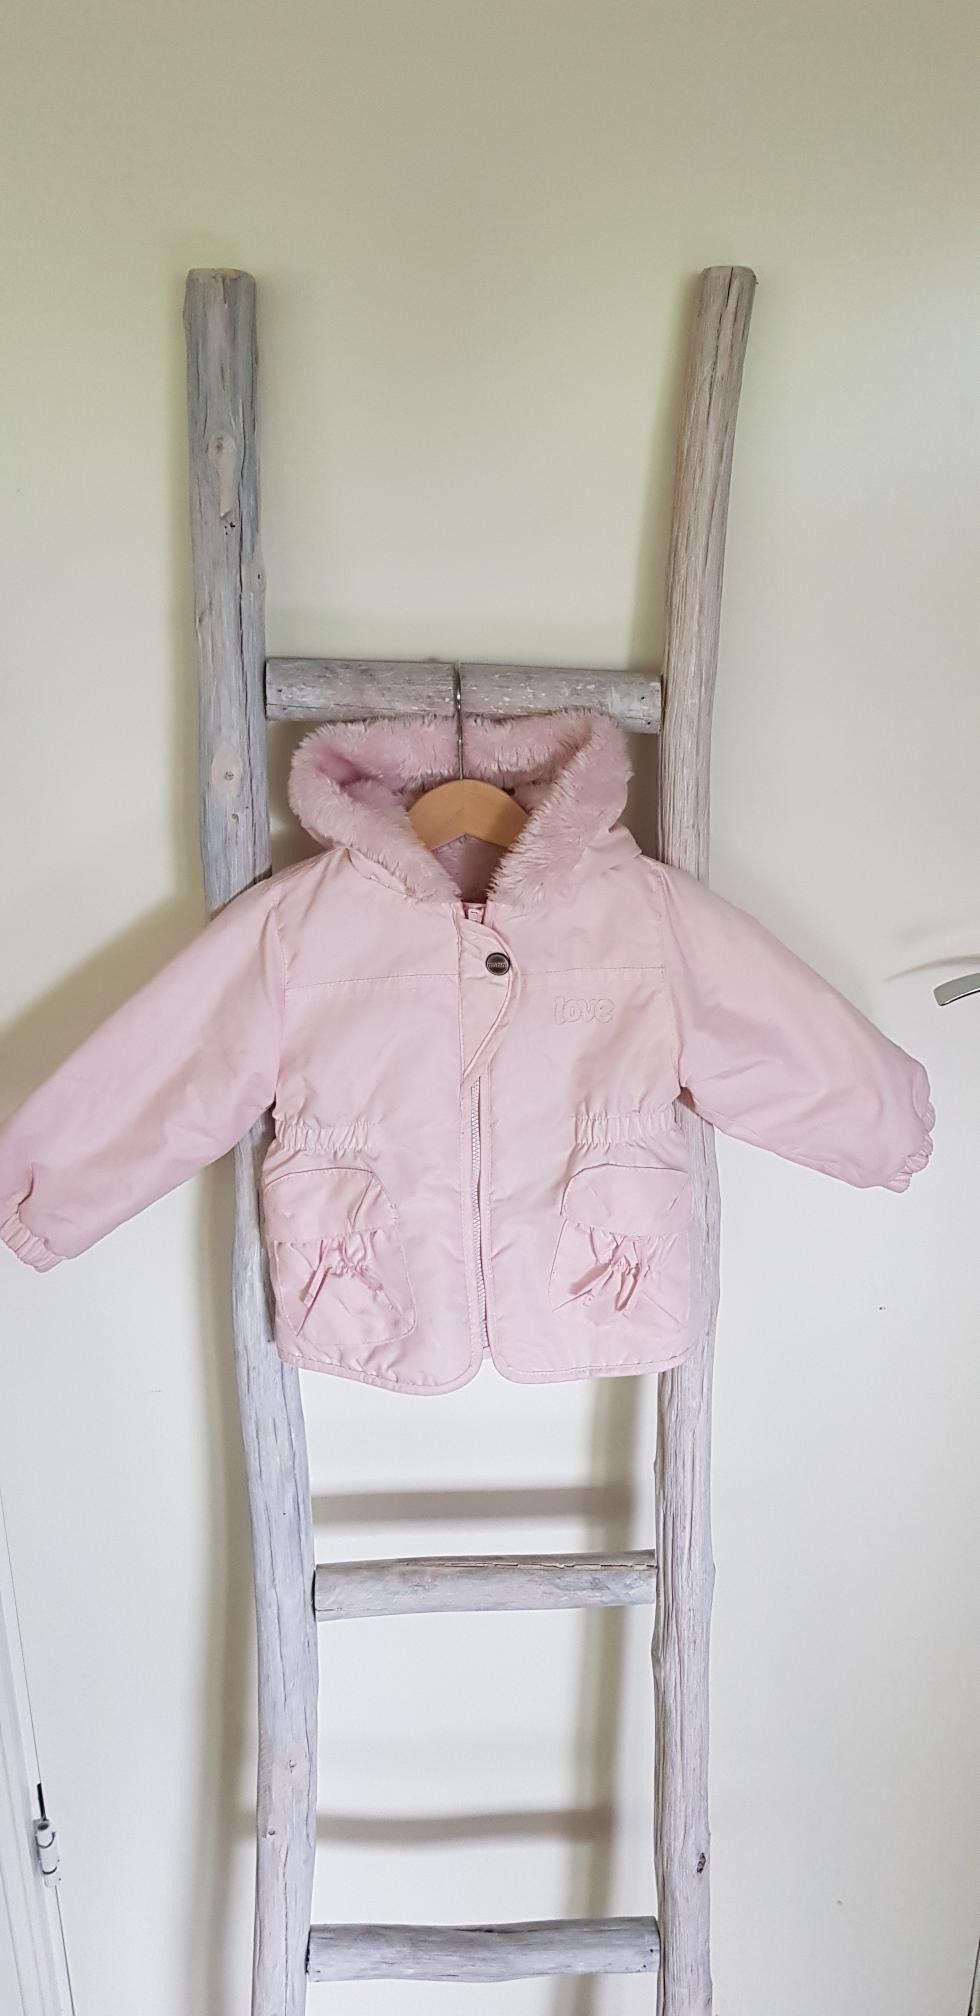 Rosa Benetton jakke til jente baby str.62 | FINN.no